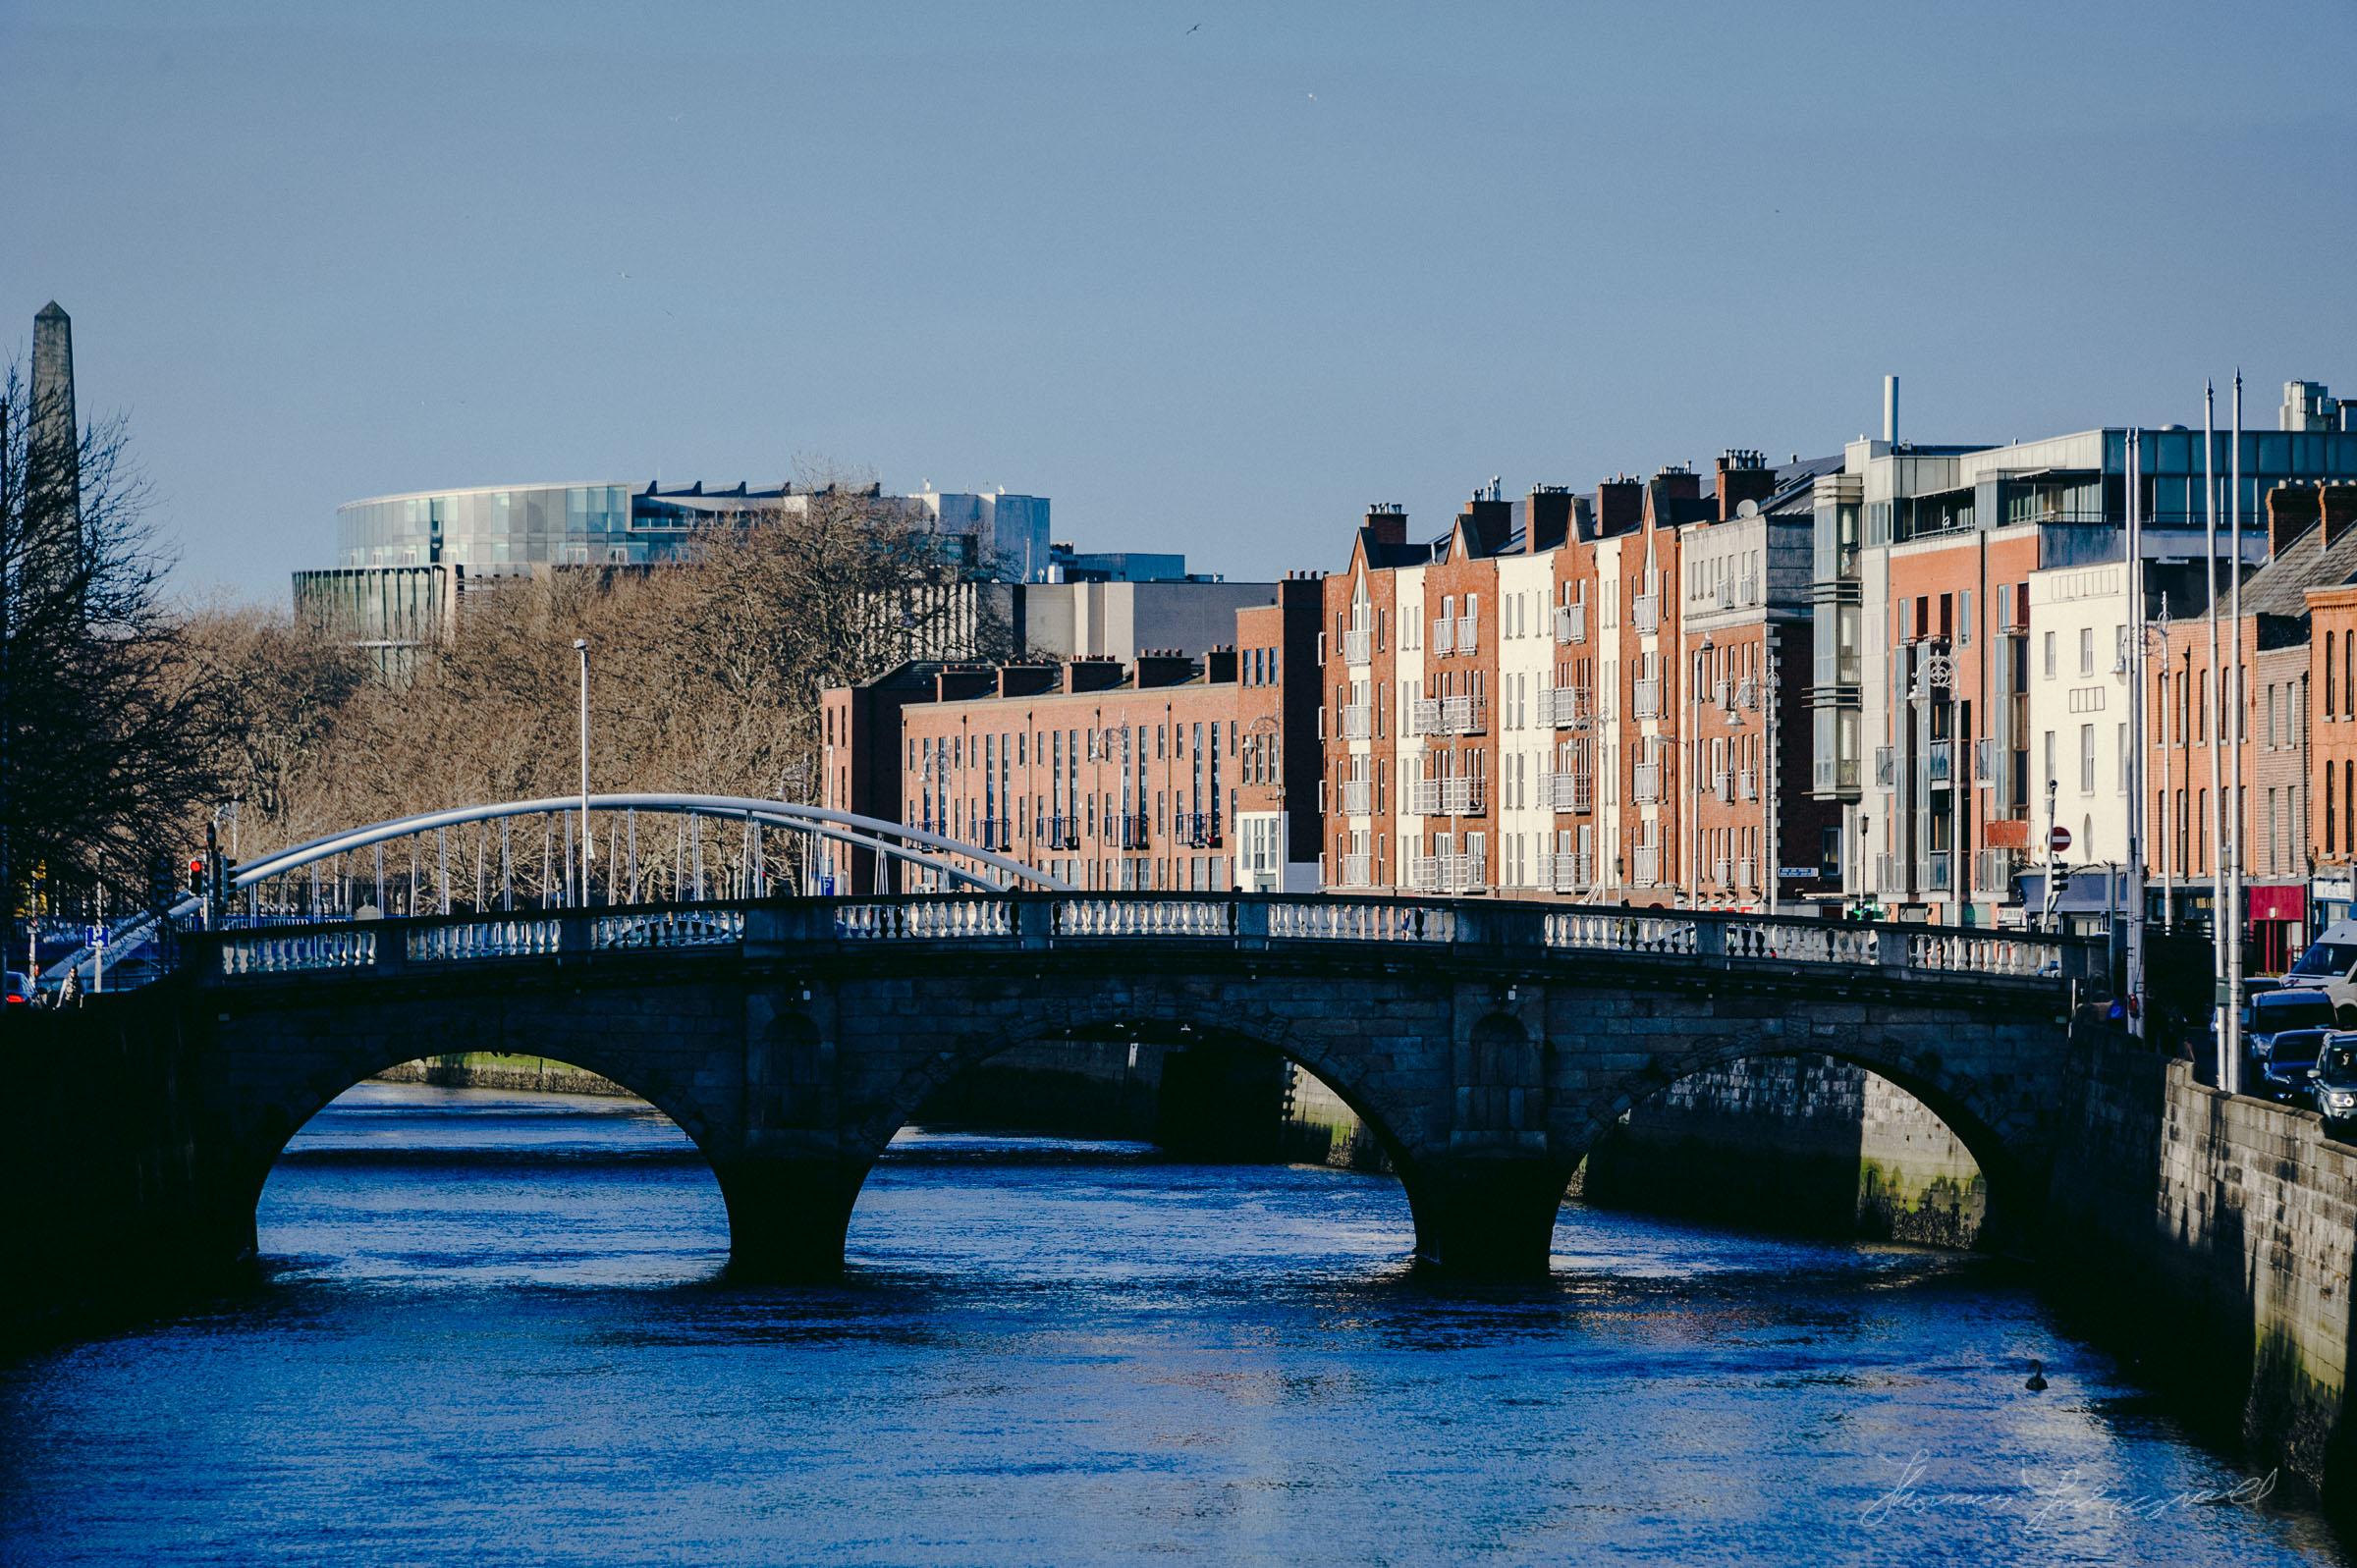 A December Walk along the Liffey - Bridges in the Distance